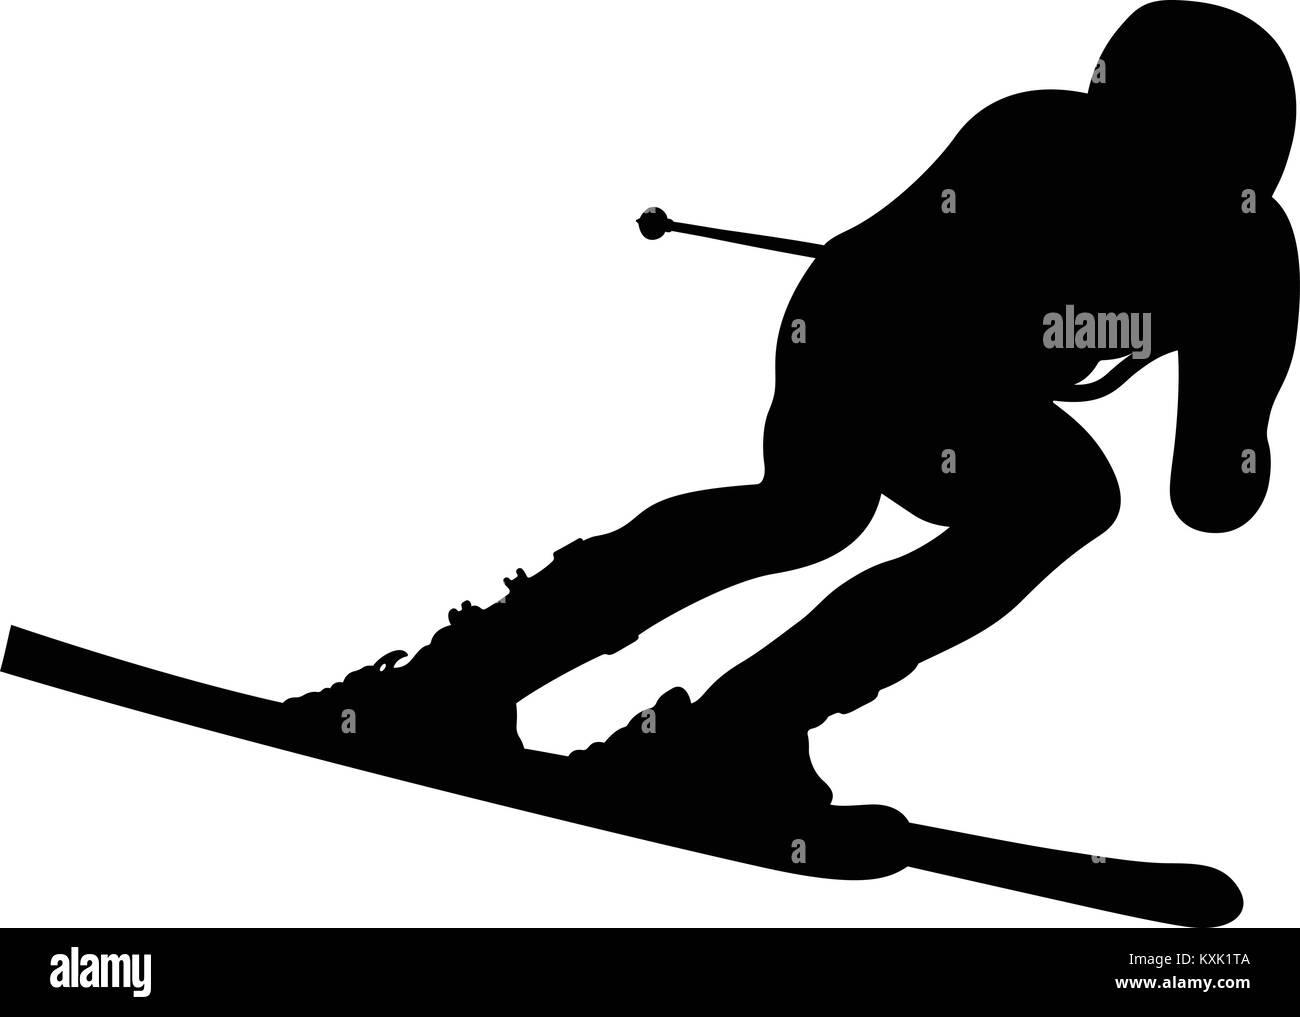 dynamic athlete skier in alpine skiing downhill - Stock Vector